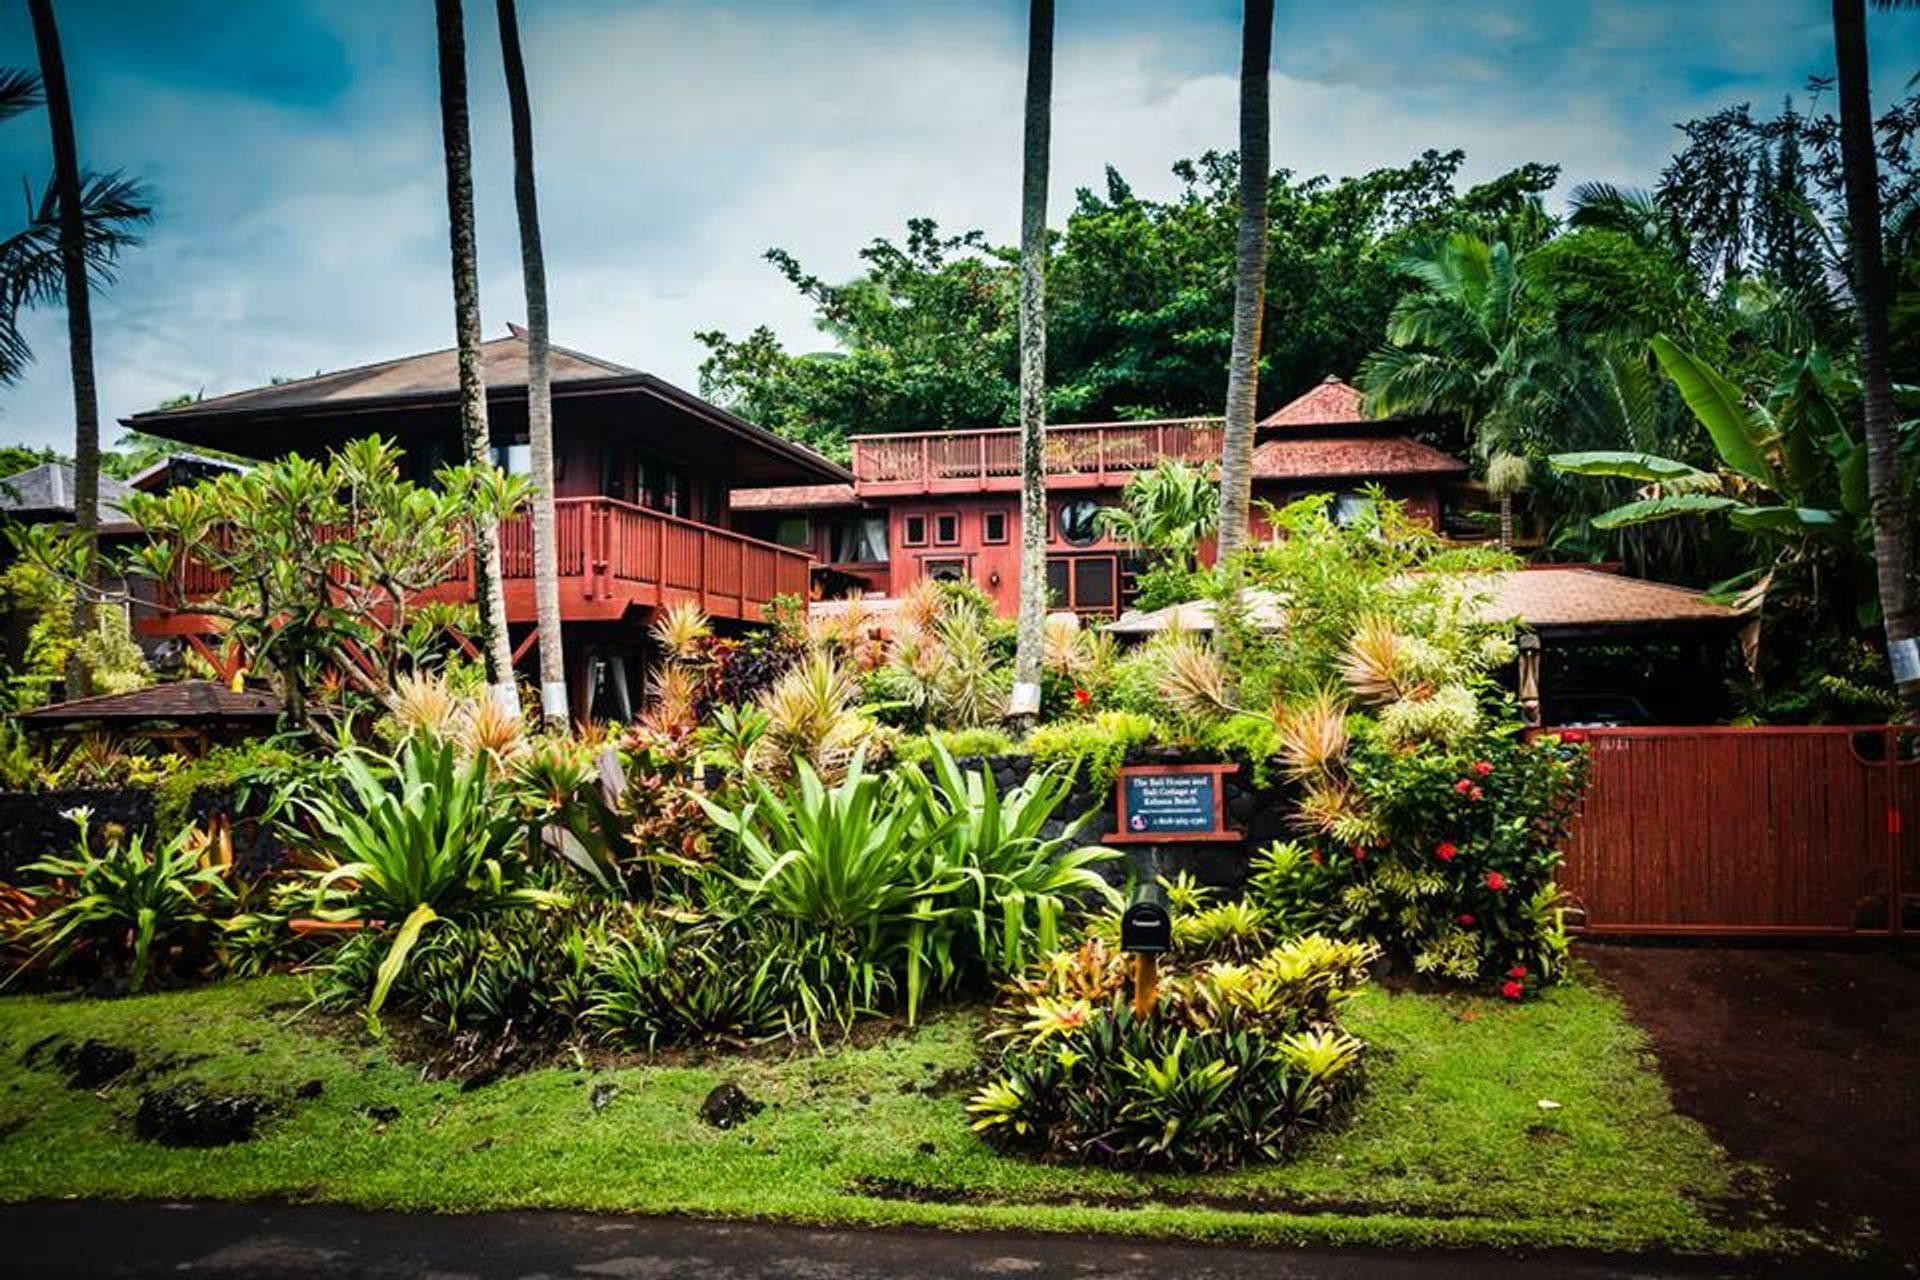 The Bali House & Cottage at Kehena Beach Hawaii